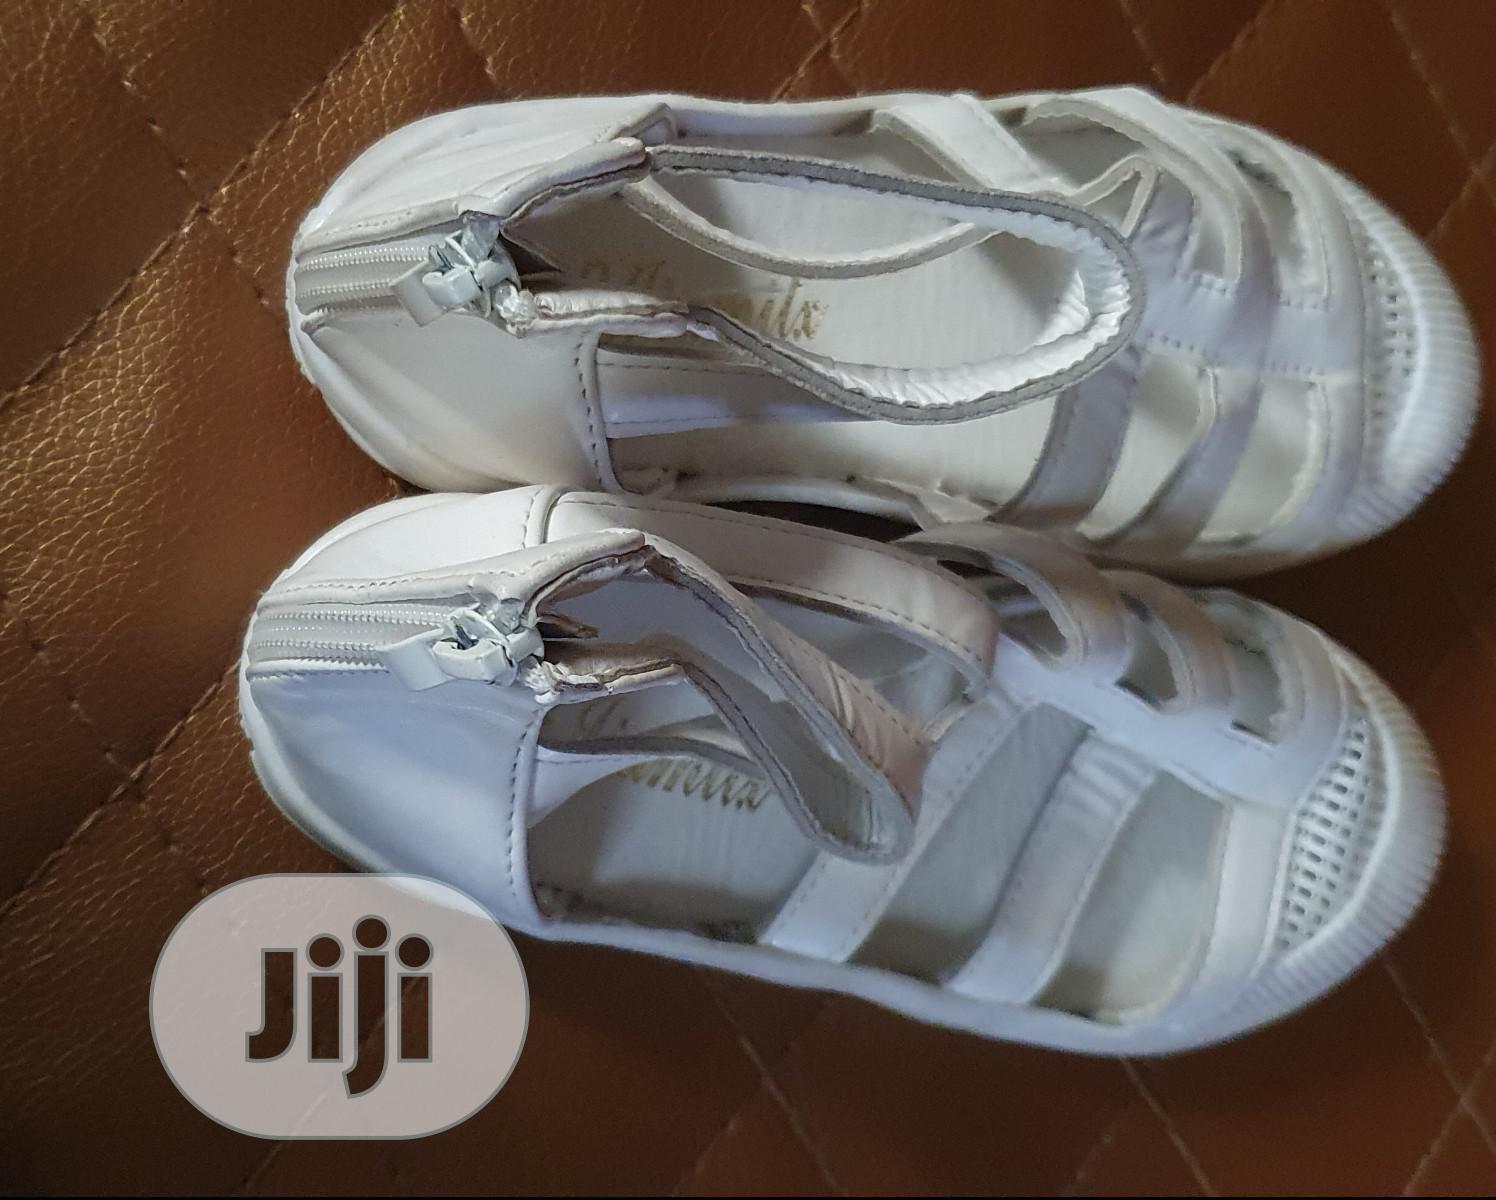 Kidddies Sandals Available